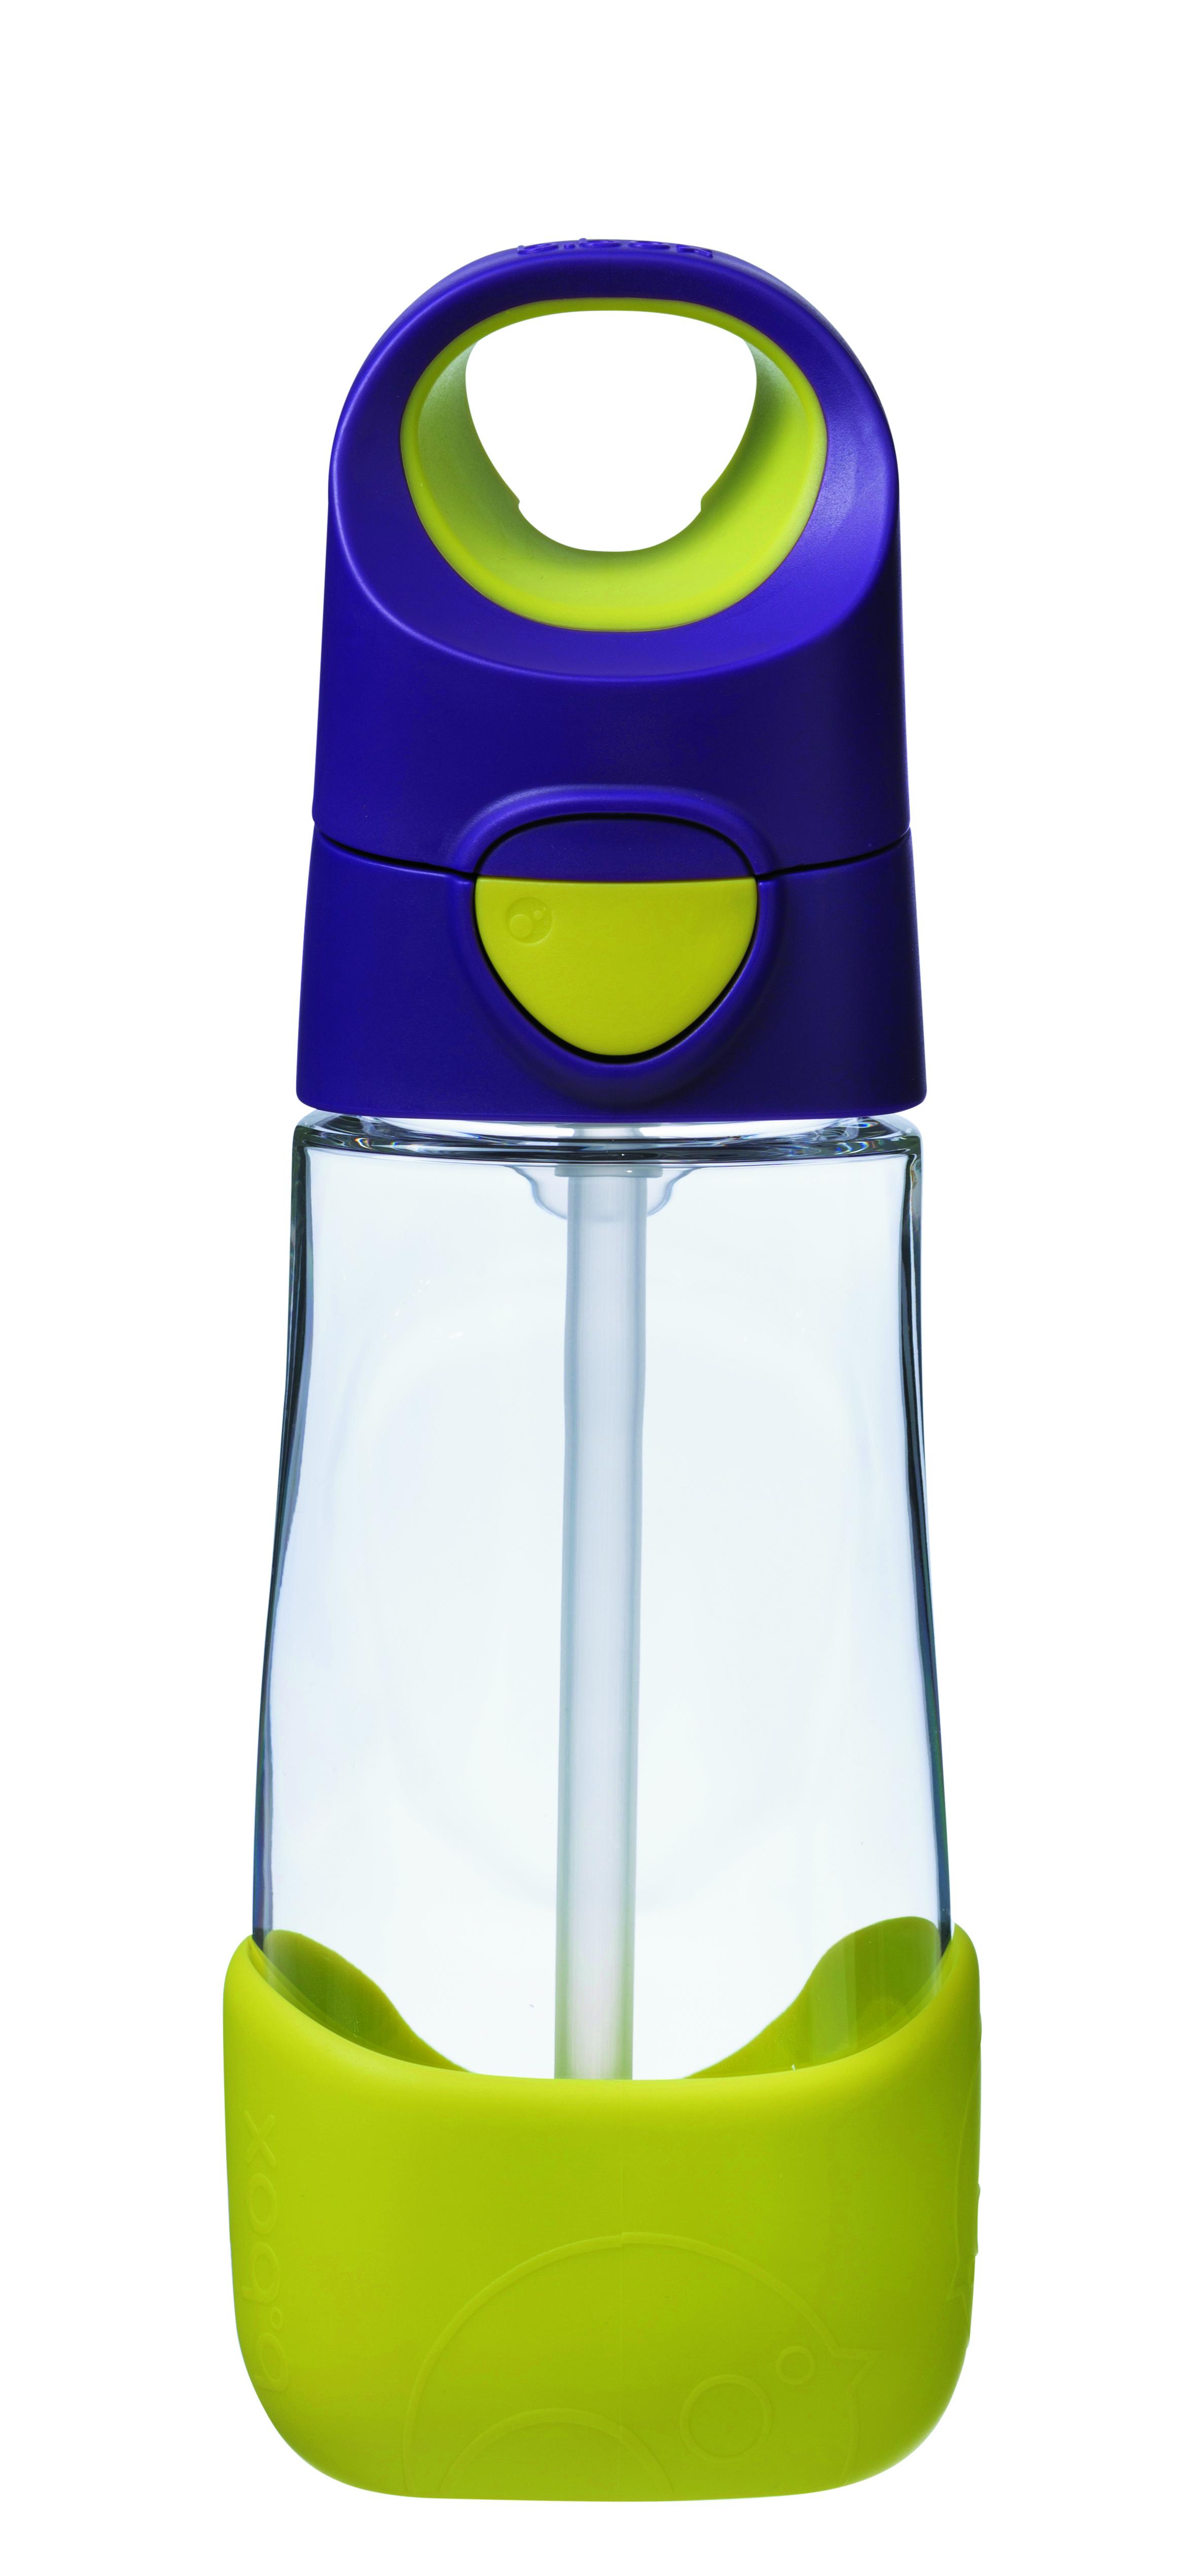 b.box Tritan Drink Bottle